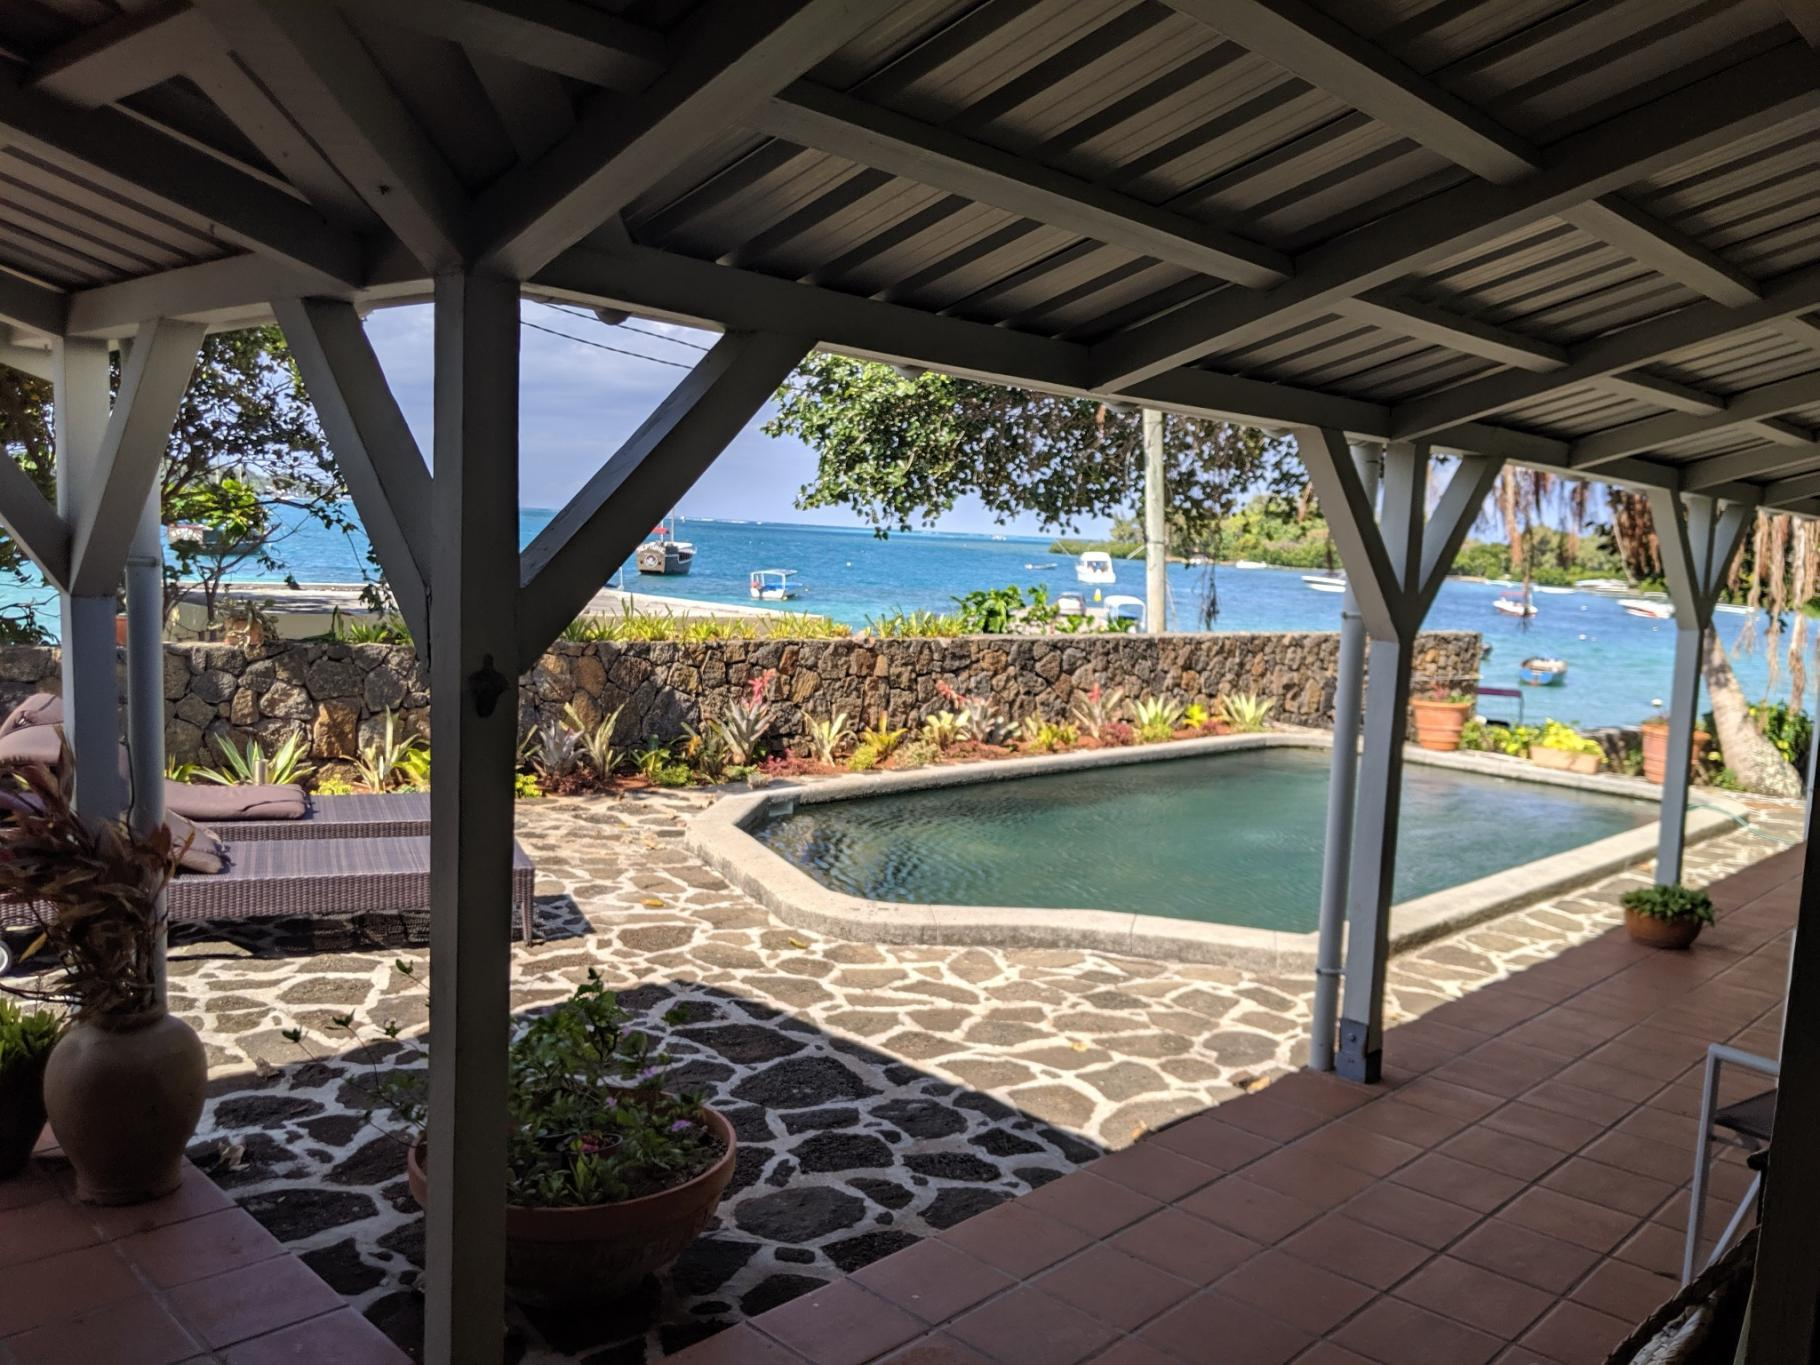 FOR SALE – Beautiful beachfront house of 169 m2 in Trou D'eau Douce